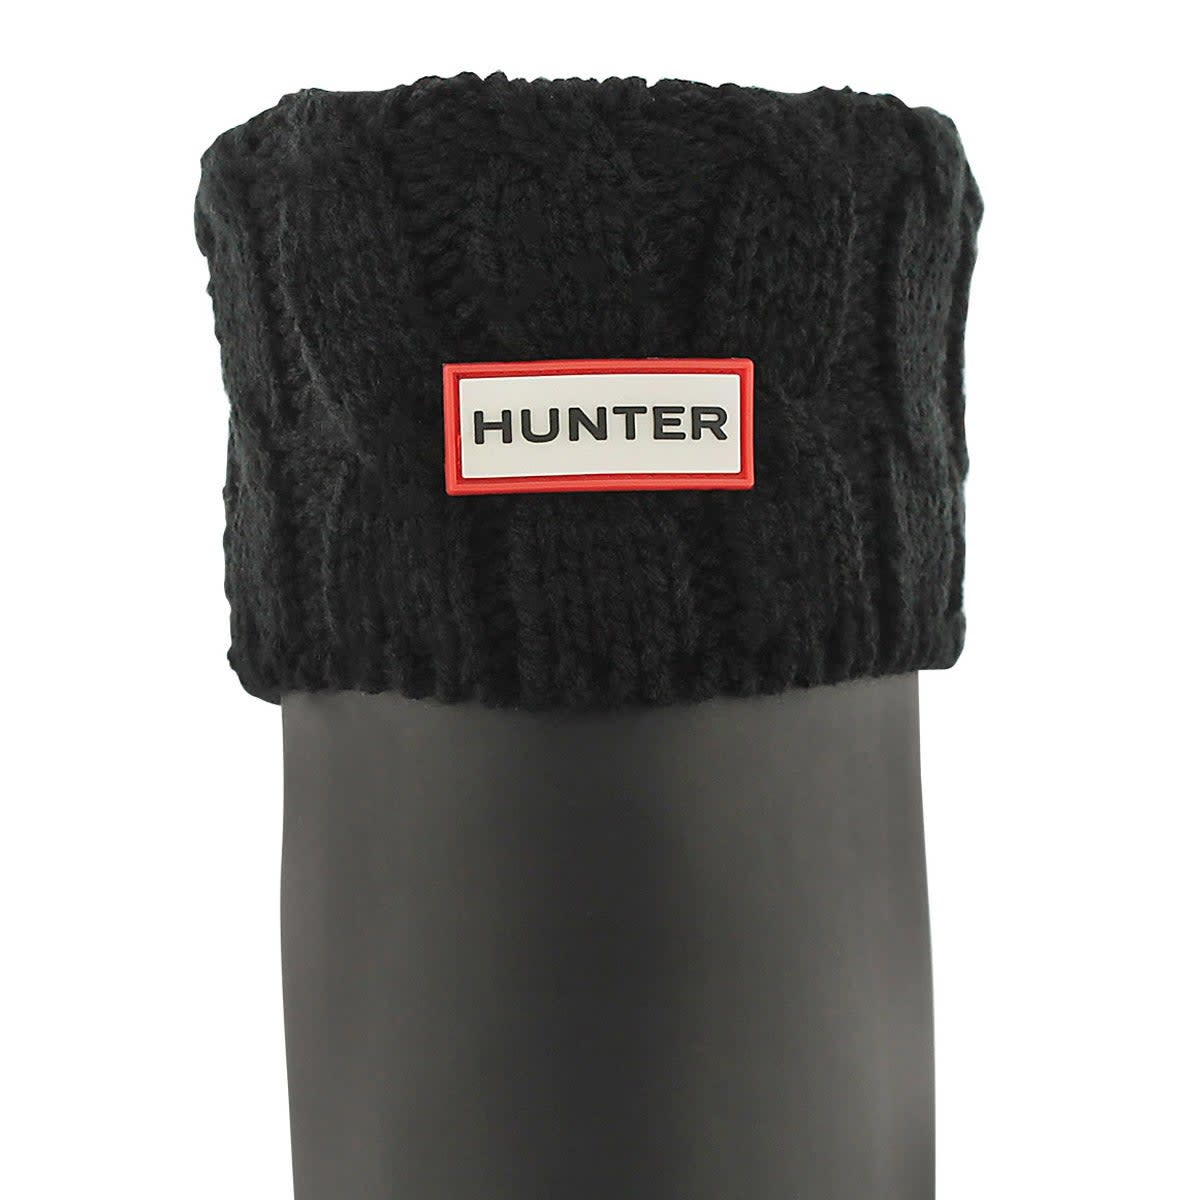 HUNTER 6 STCH CABLE SOCKS SHORT